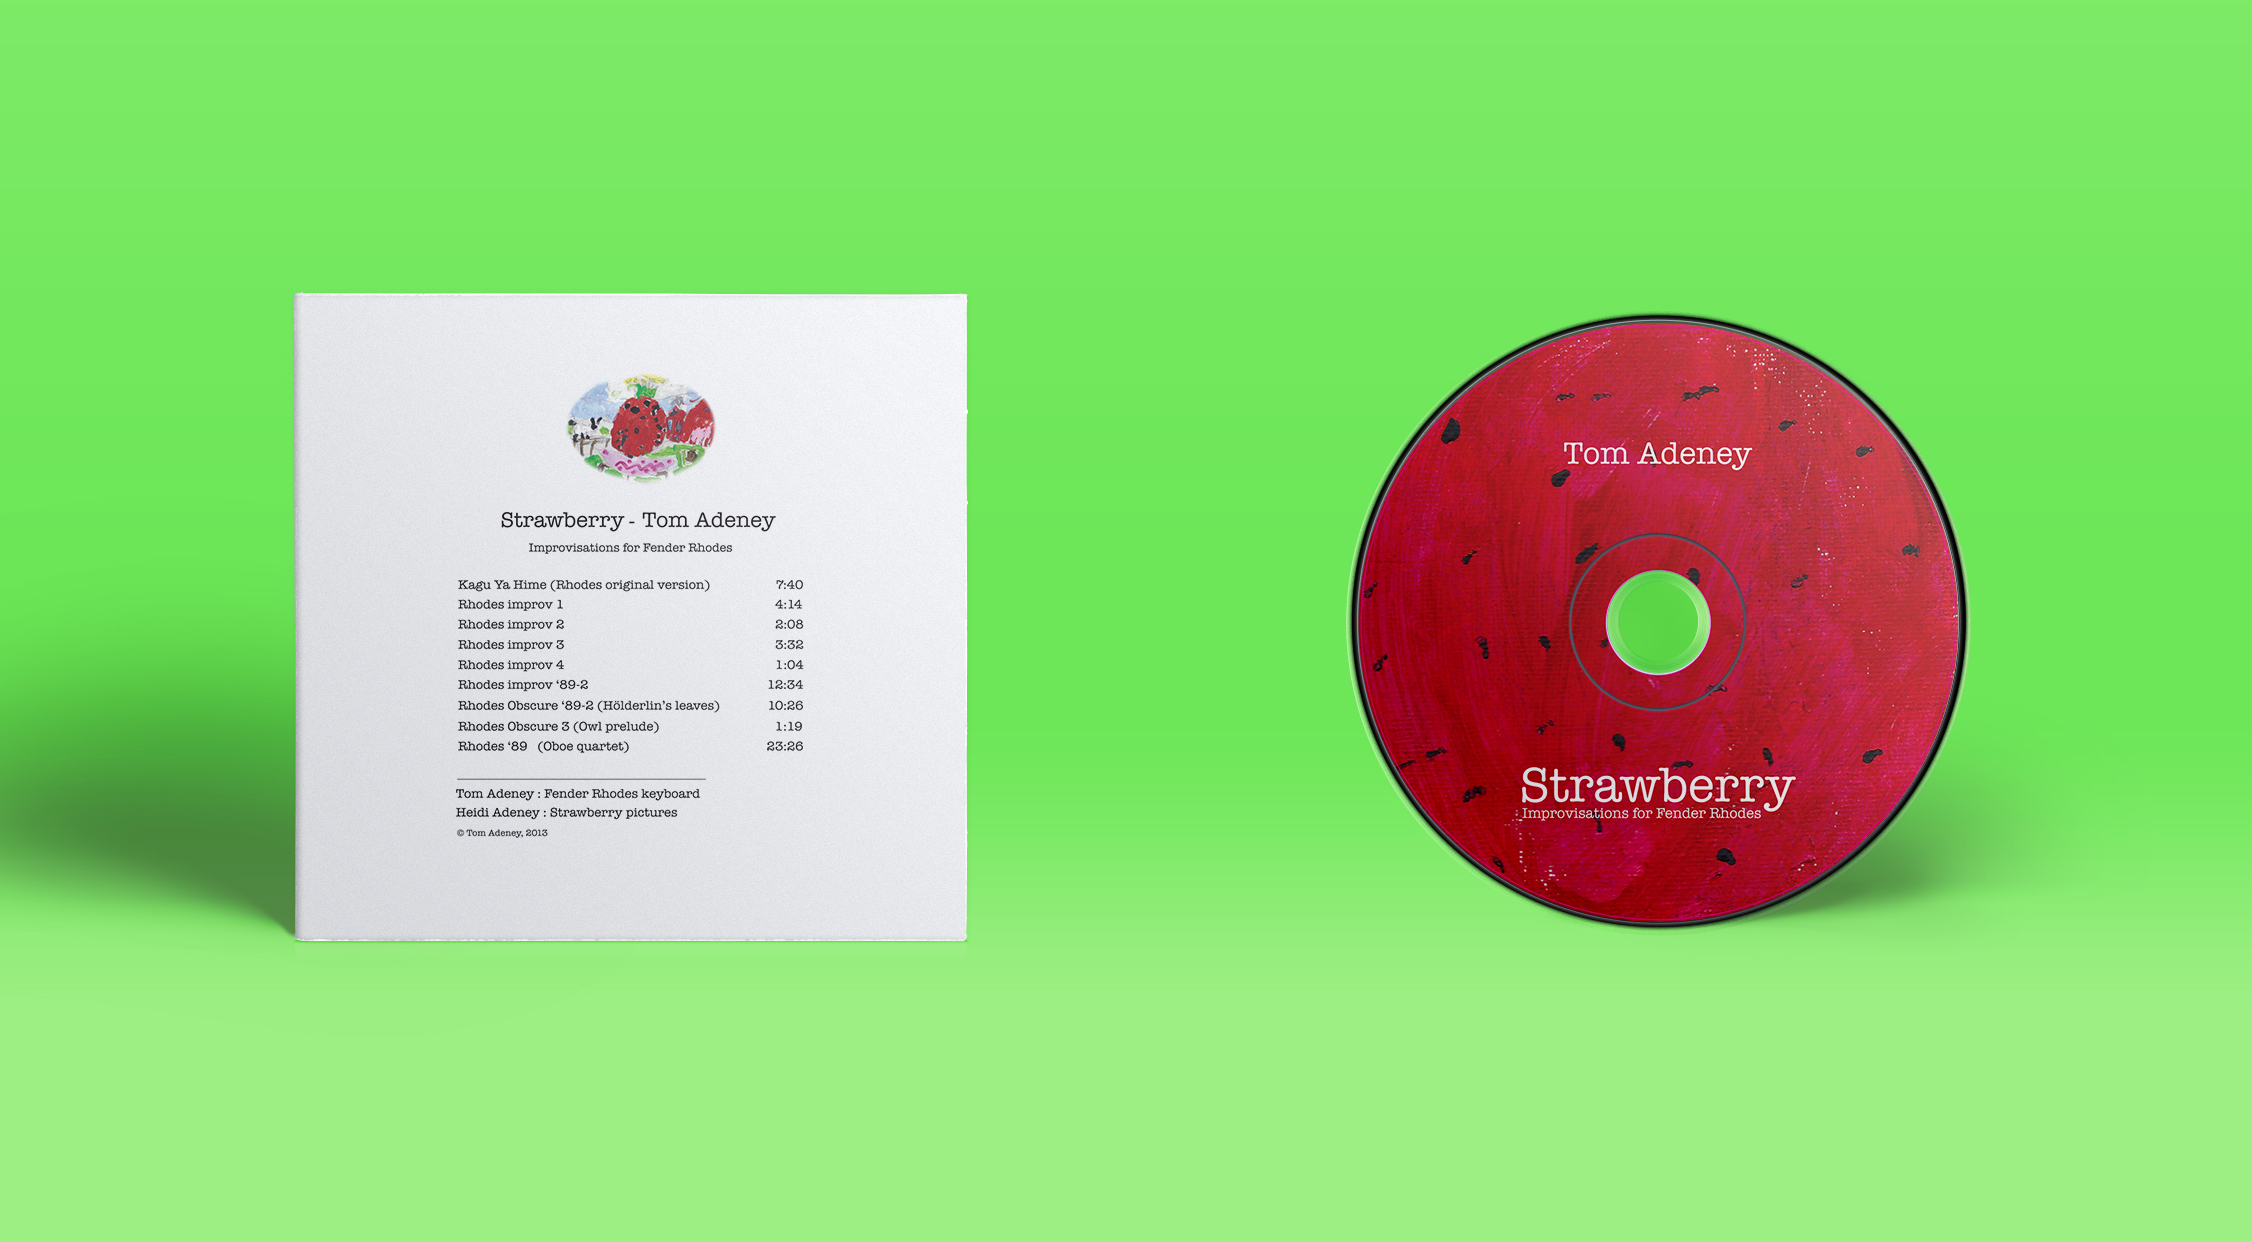 Tom-Adney---Strawberry-CD-back-and-disk-Mockup.jpg